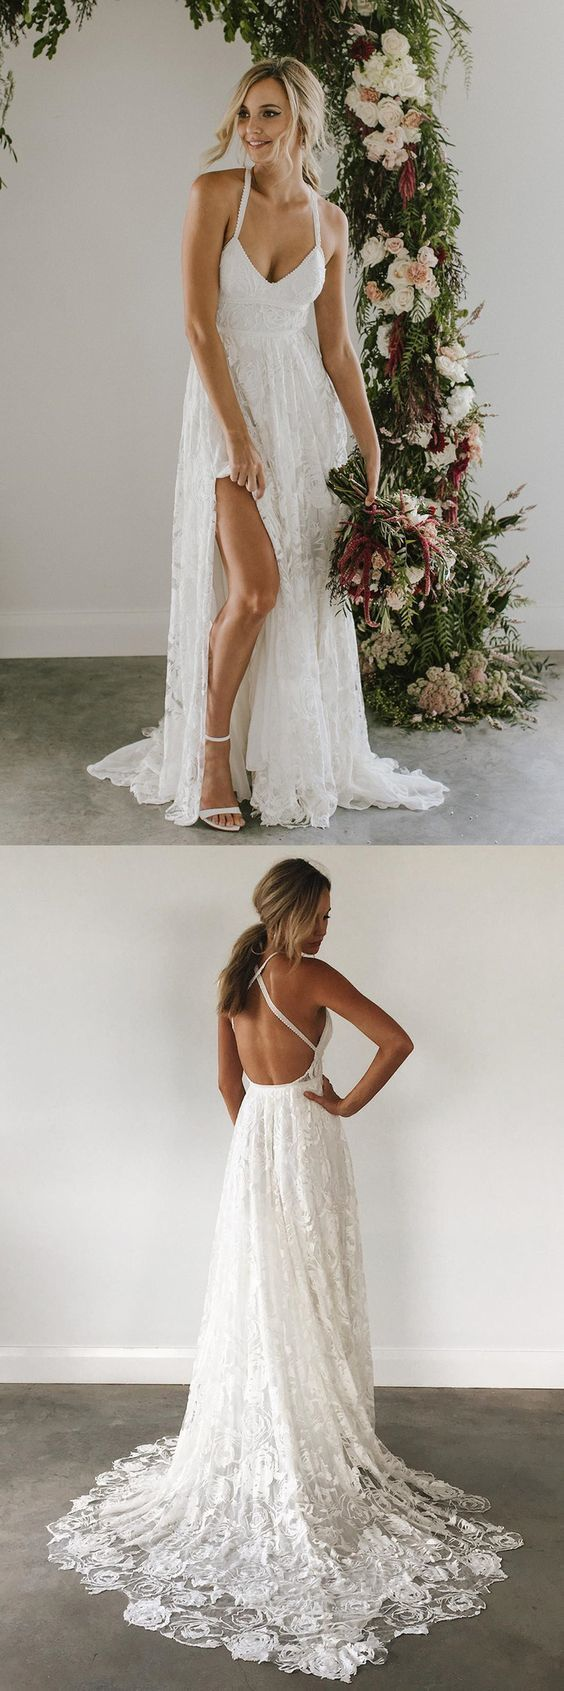 Sexy beach wedding dress white v neck wedding dress lace long